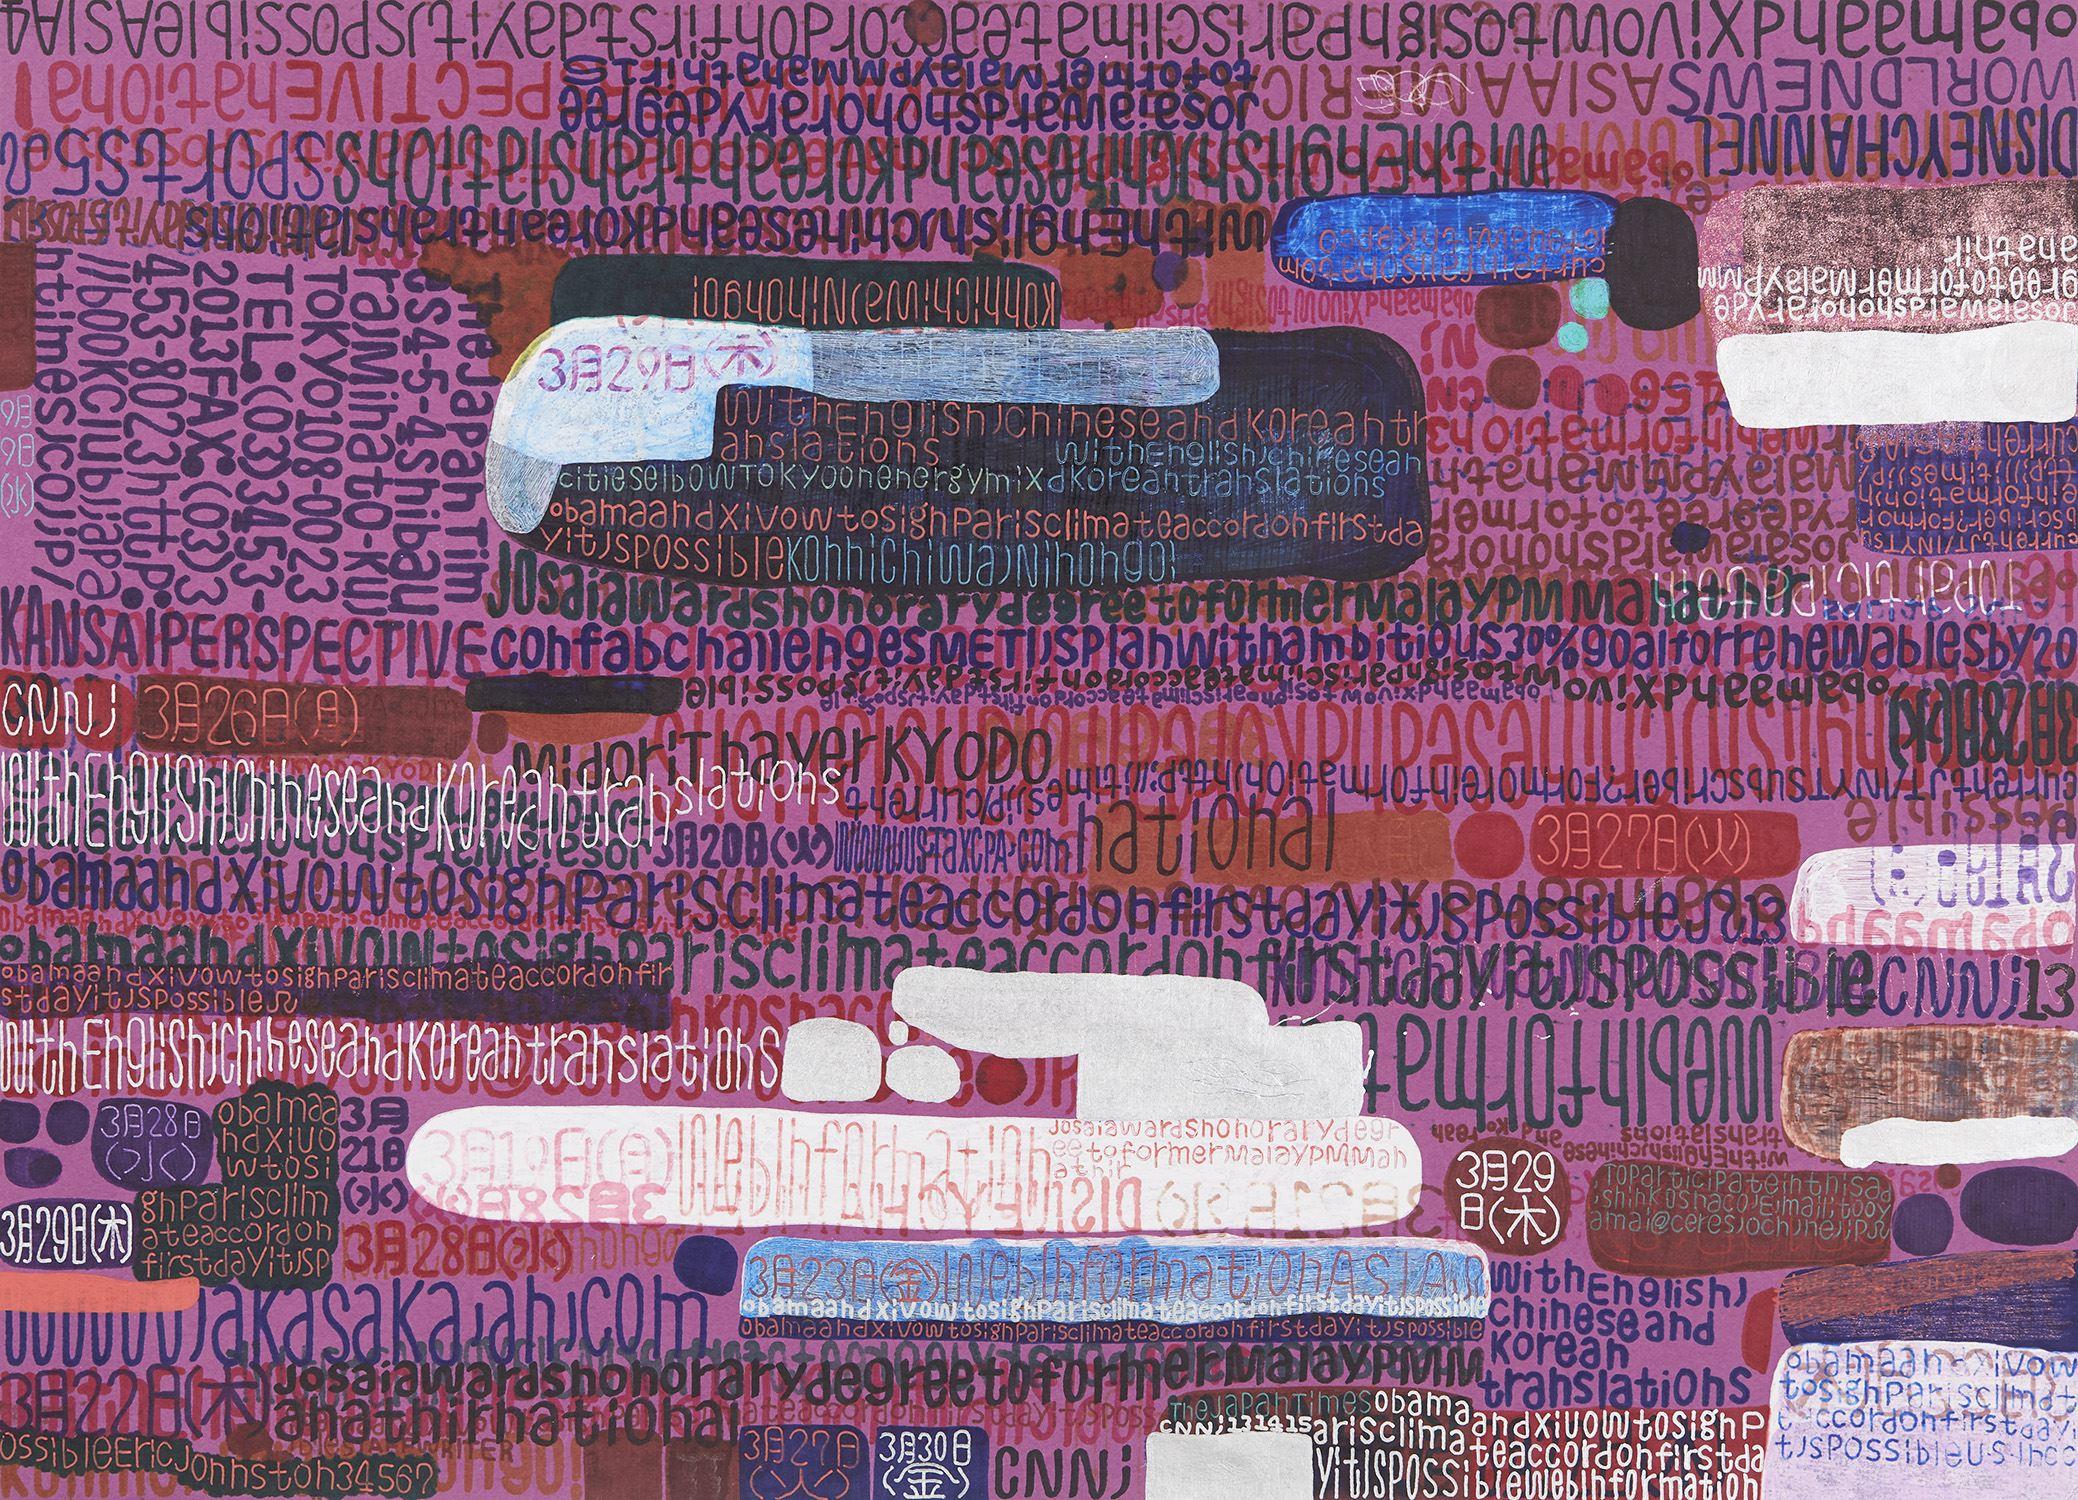 Yoshiyasu Hirano  Untitled  , 2017 Marker, color gel pen on paper 21.34 x 15.39 inches 54.2 x 39.1 cm YHi 15